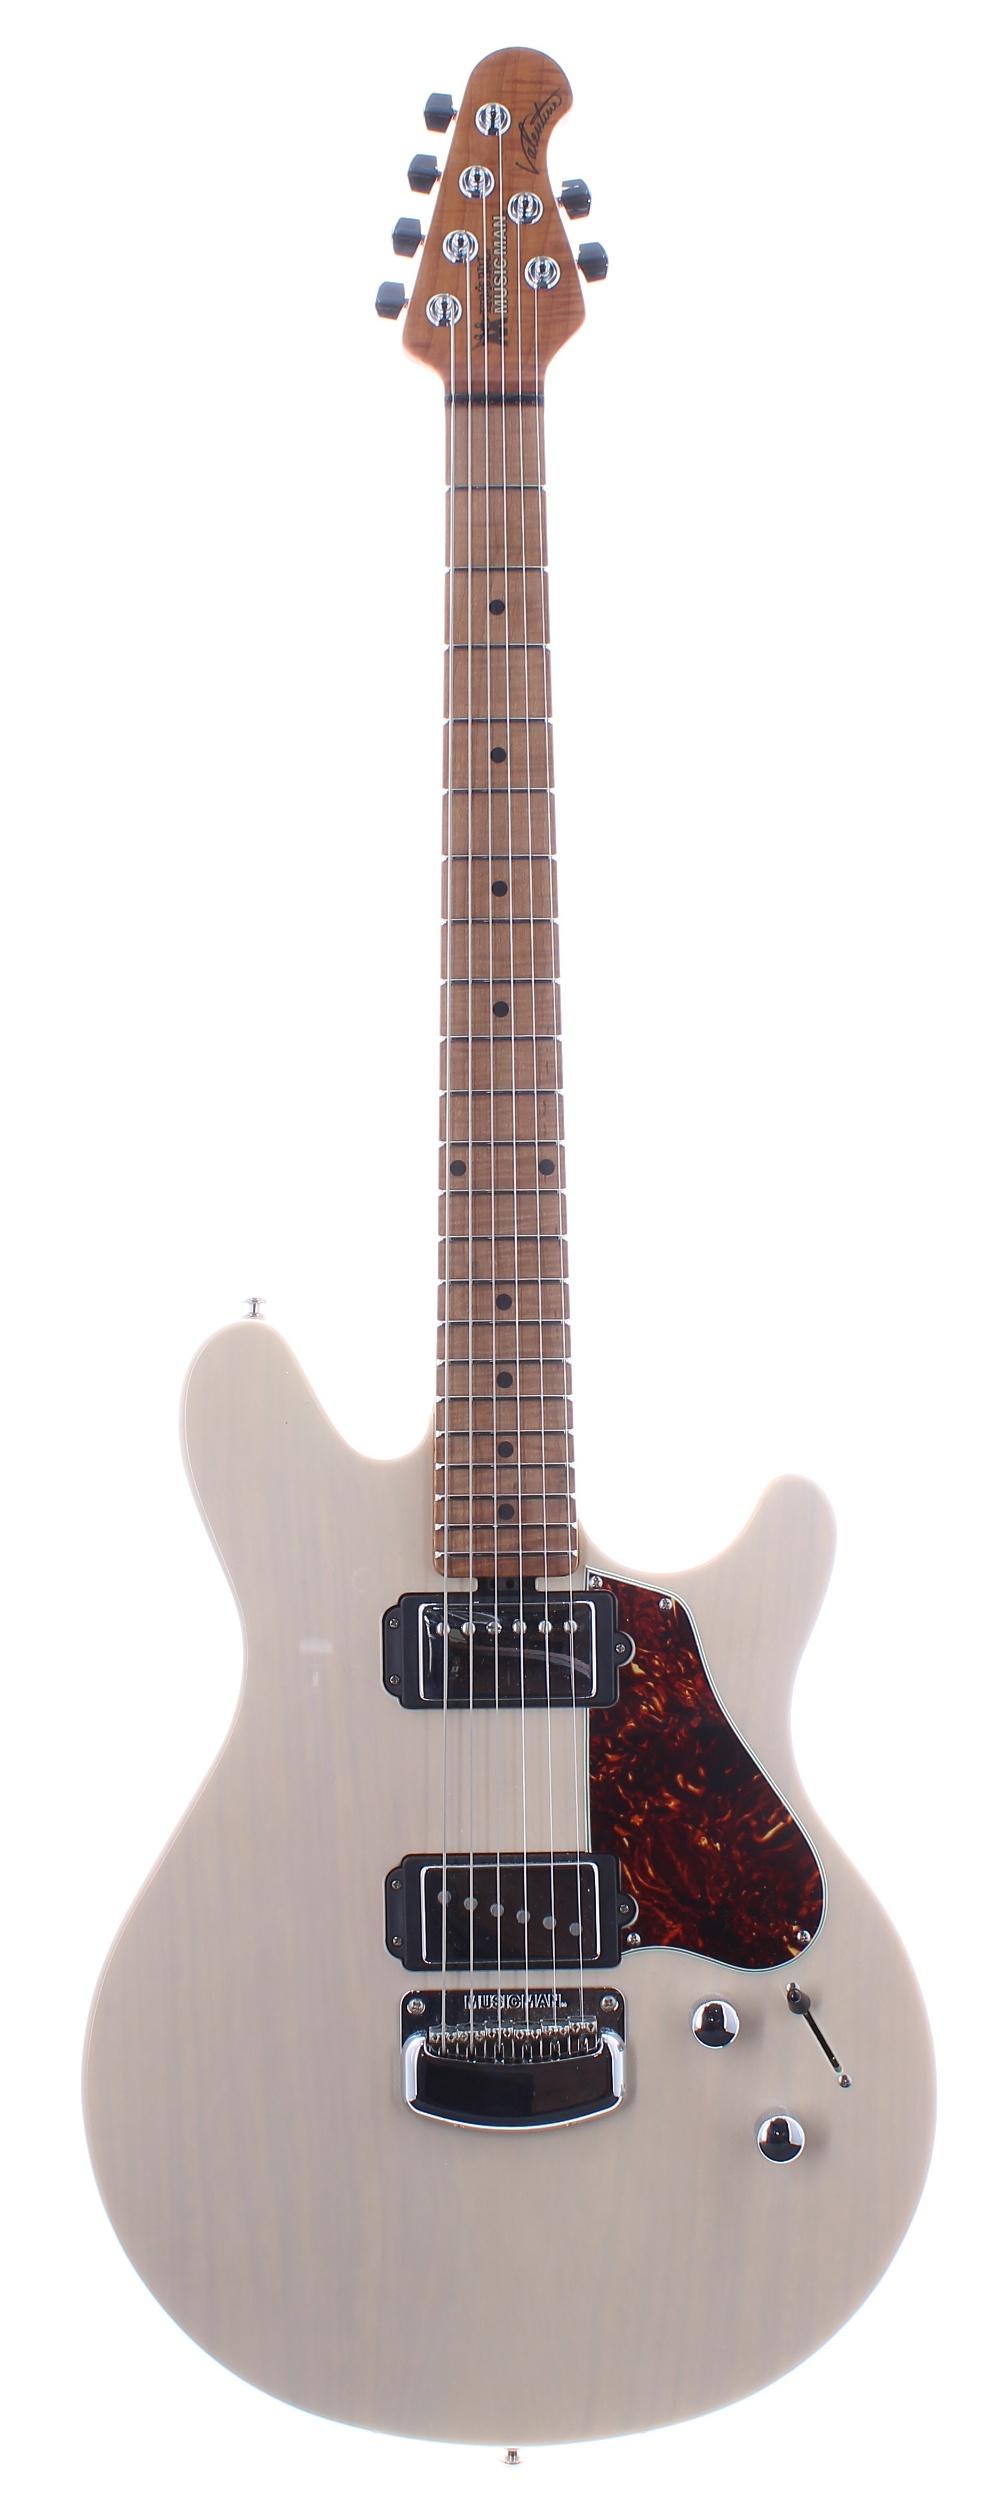 2016 Ernie Ball Music Man Valentine electric guitar, made in USA, ser. no. G7xxx5; Finish: trans